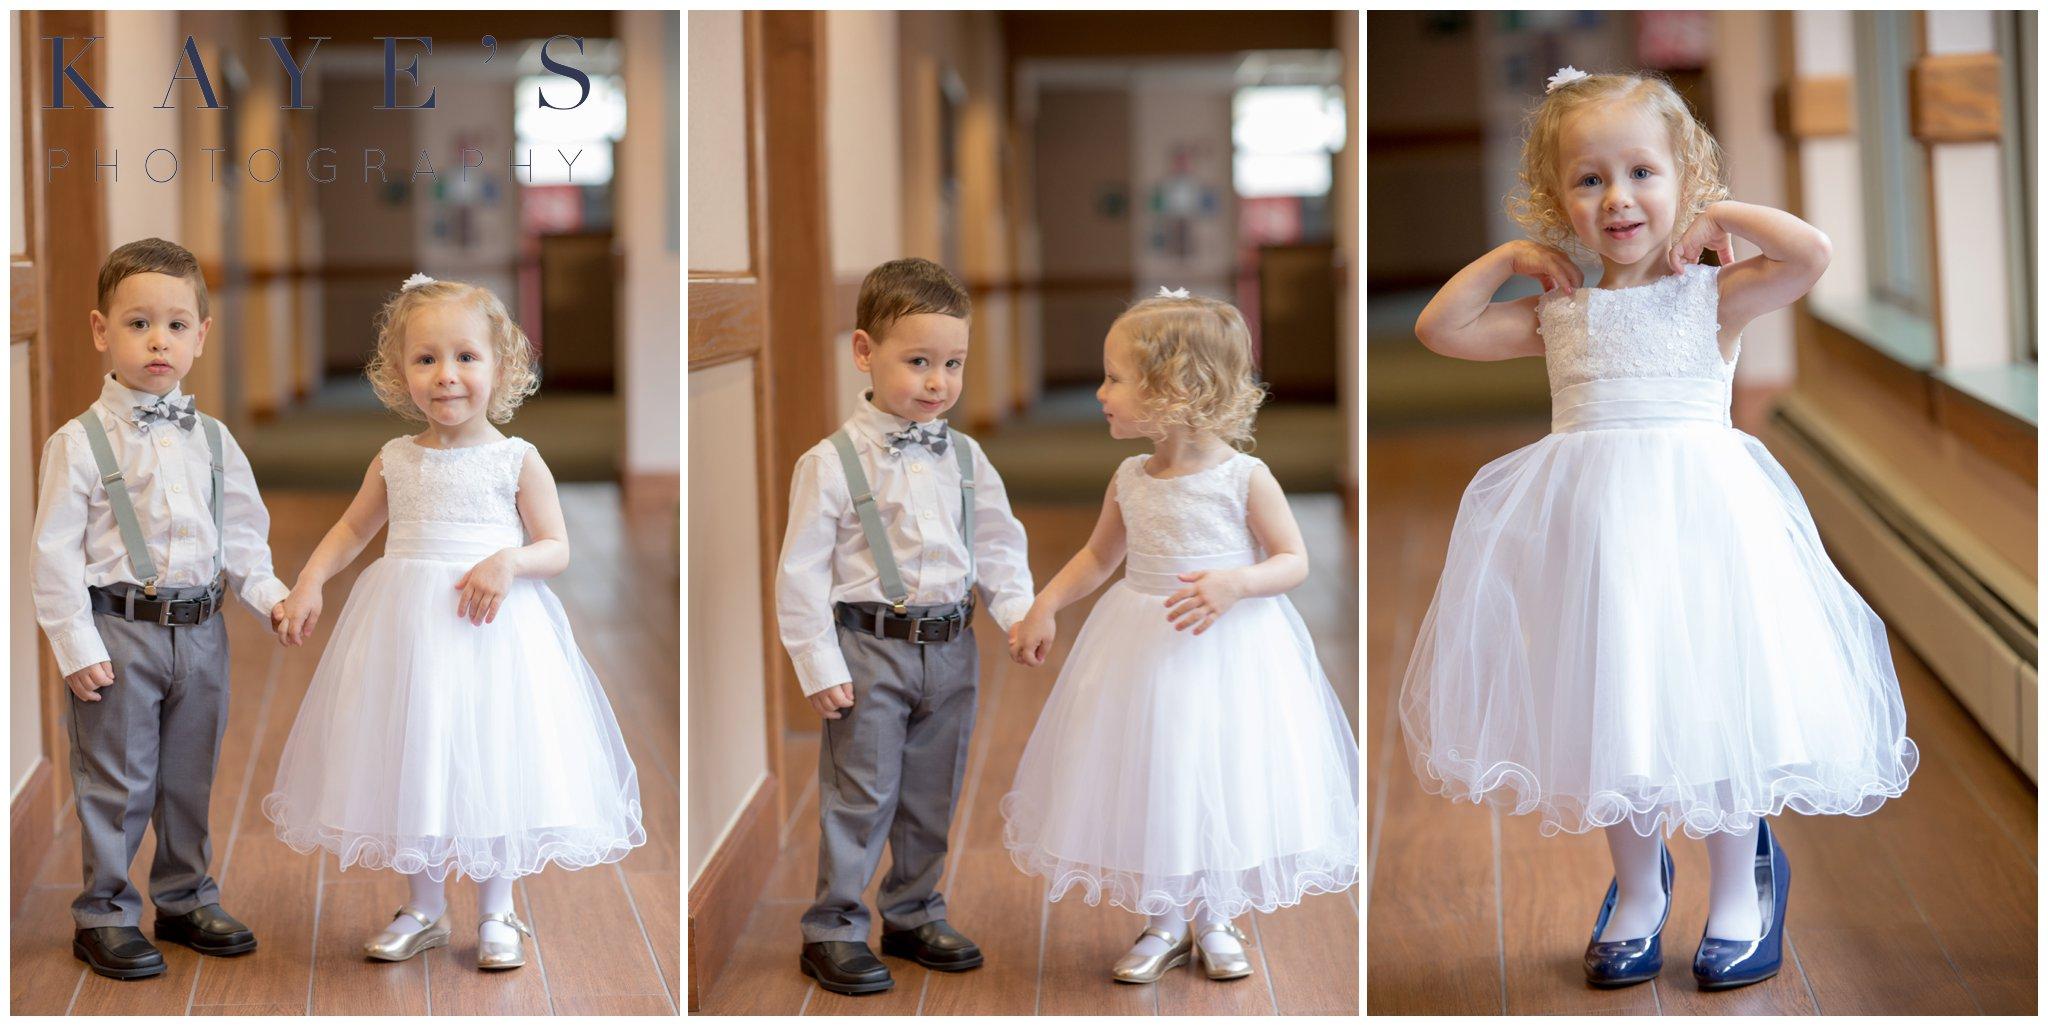 kayesphotography-clarkston-michigan-wedding-photographer_0211.jpgkayesphotography-clarkston-michigan-wedding-photographer